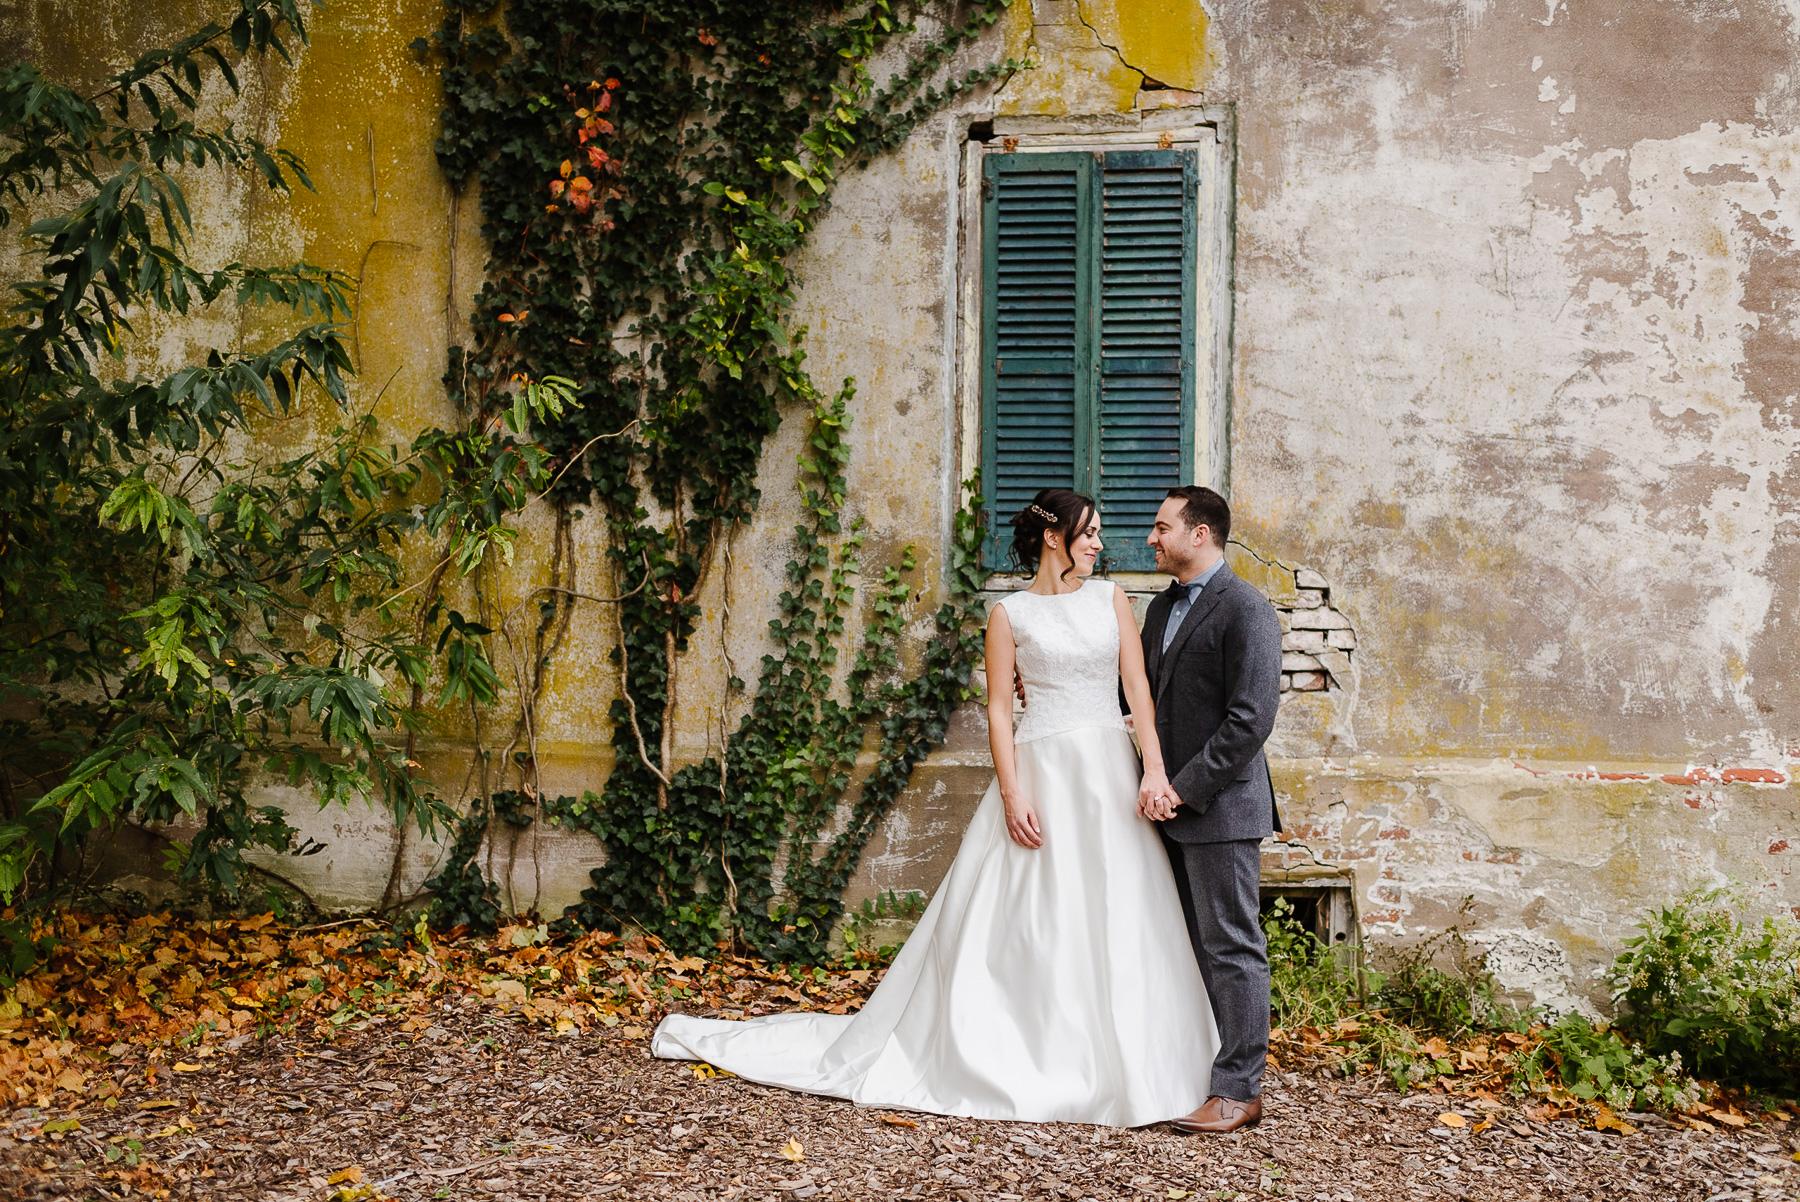 24-Laurita Winery Wedding New Jersey Wedding Photographer Laurita Winery Weddings Longbrook Photography.jpg